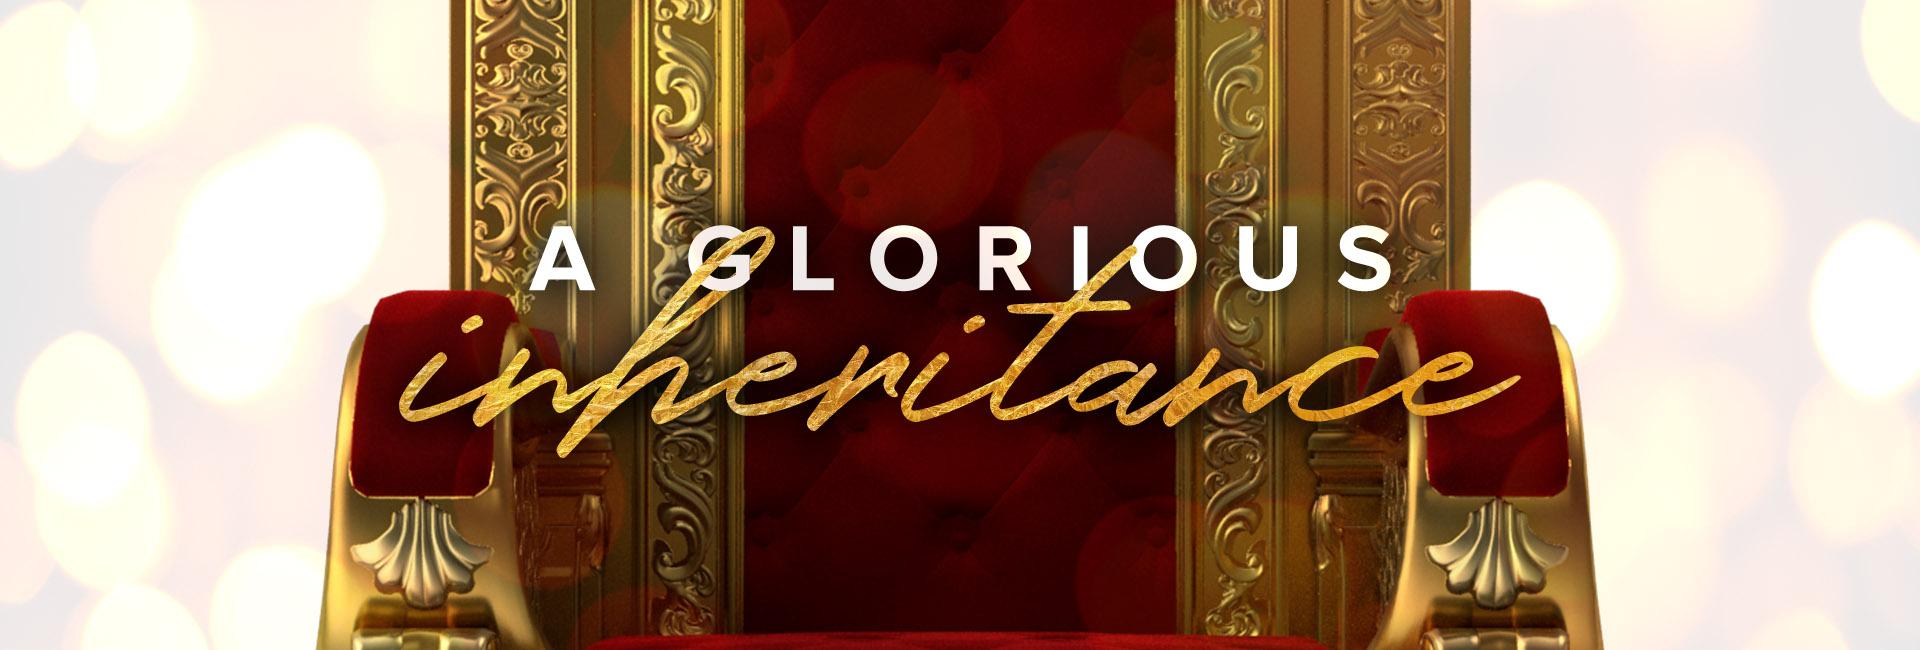 Glorious Inheritance